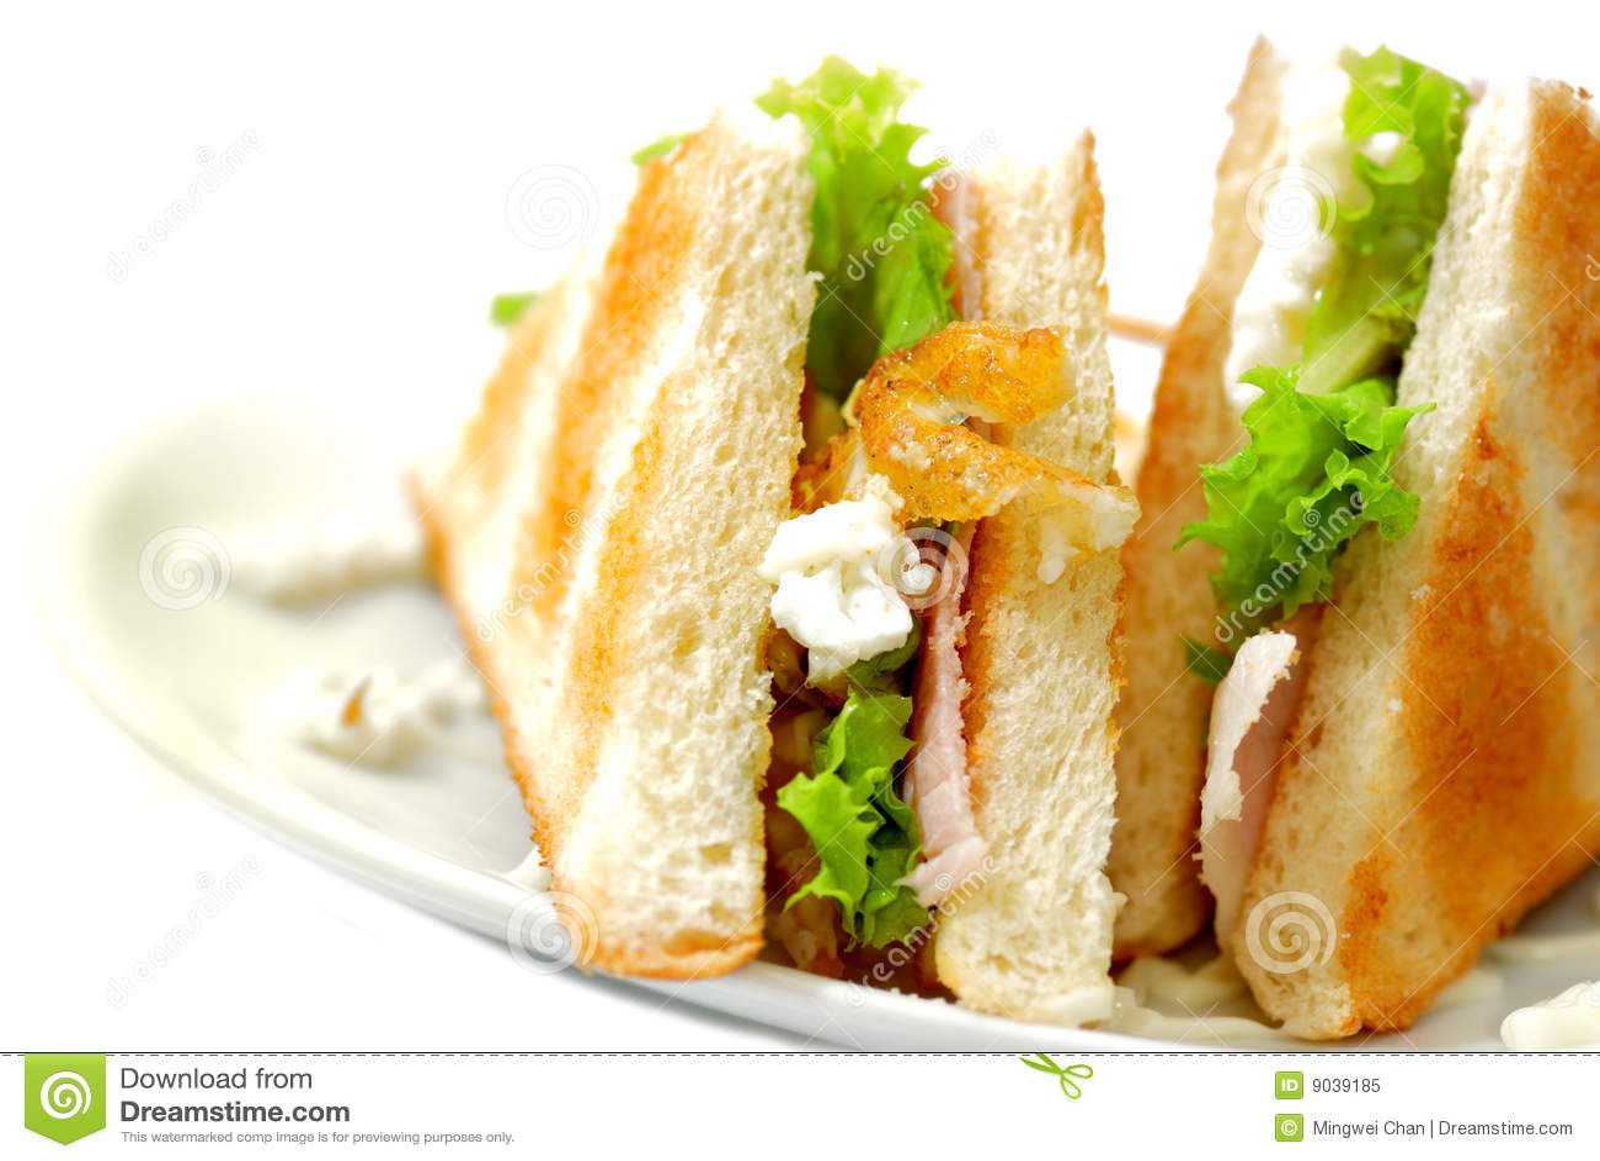 Western Food Series 2 Royalty Free Stock Photo Image